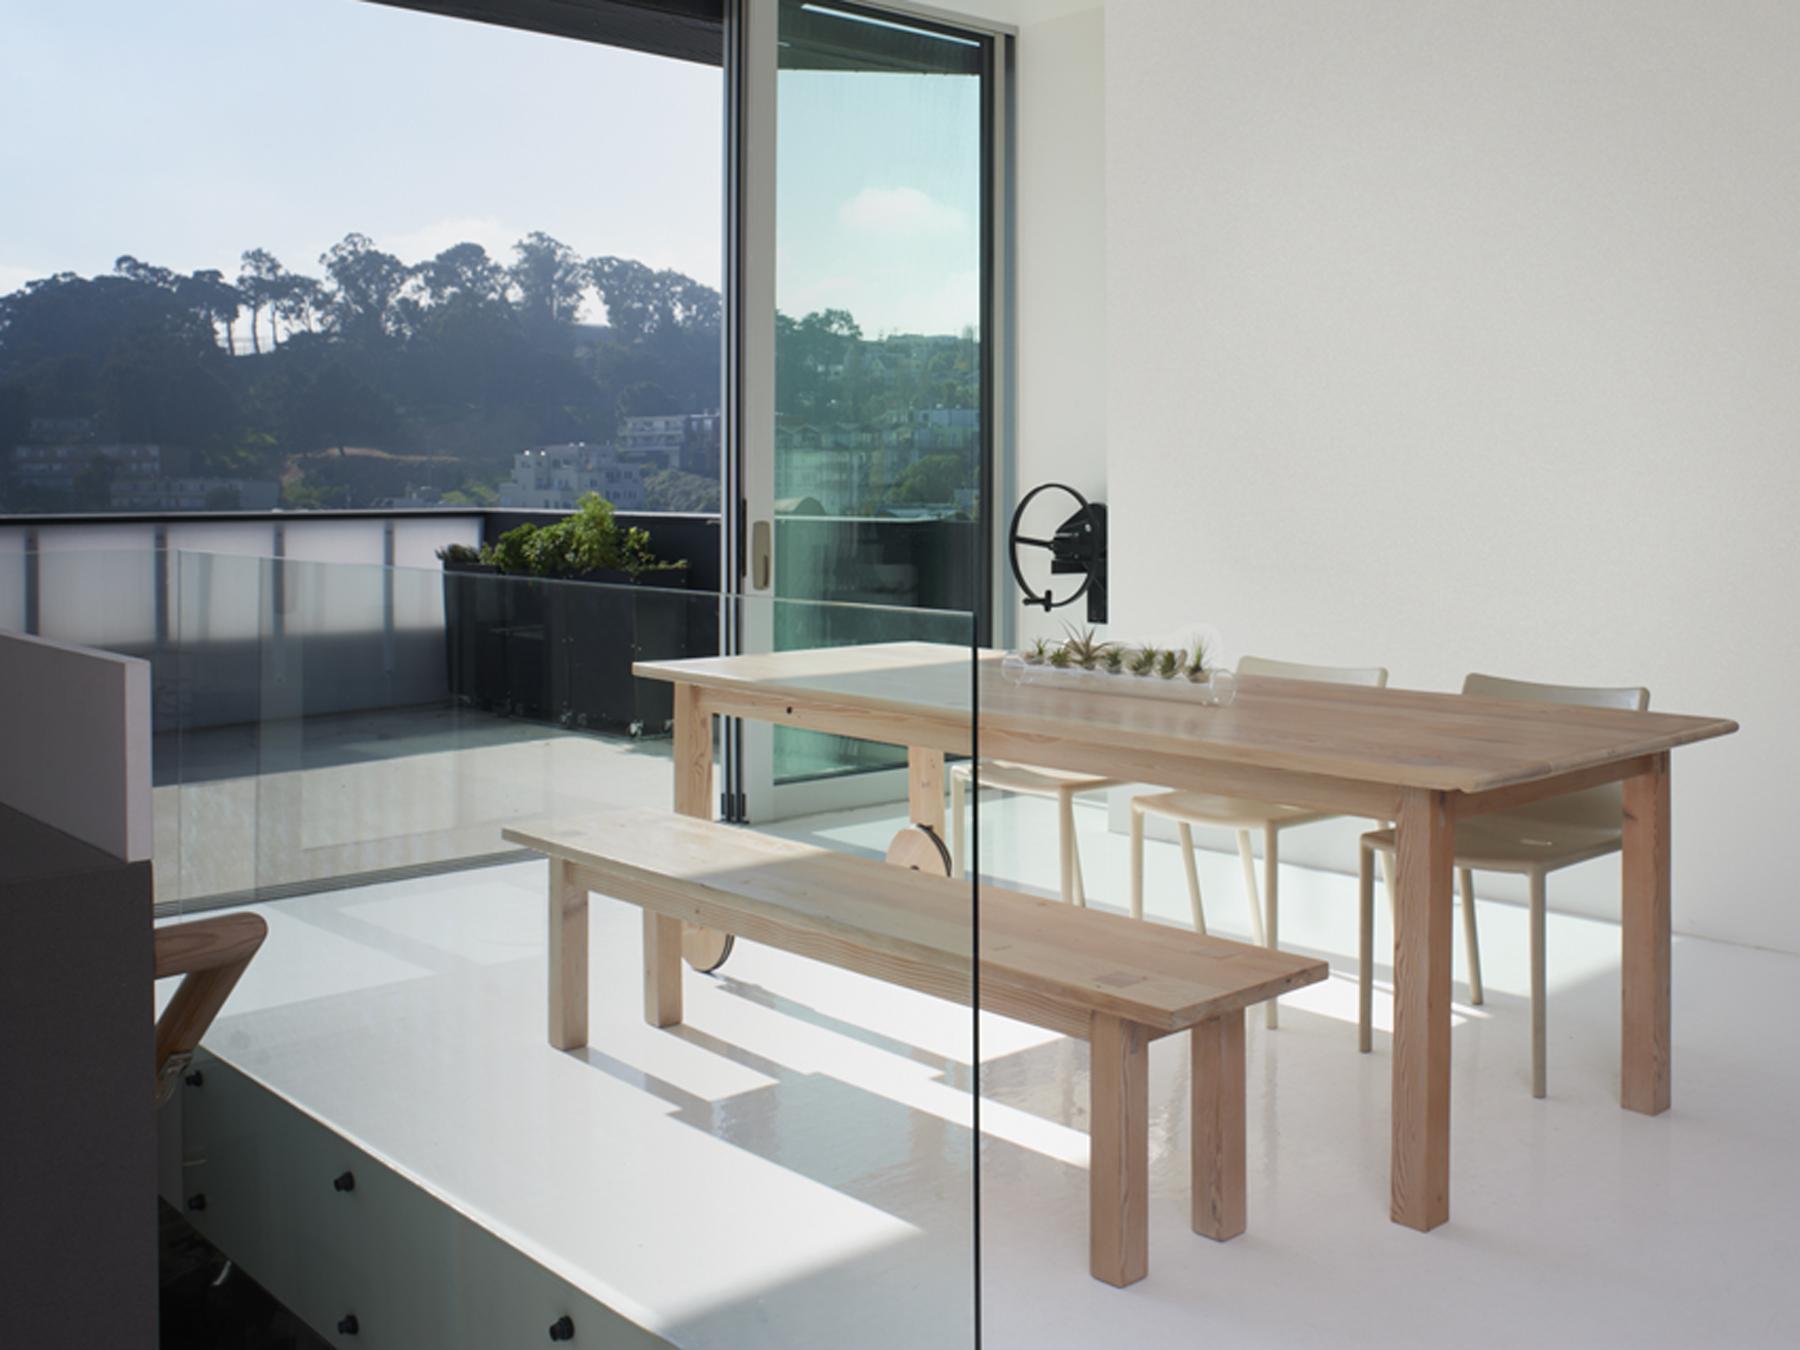 barrow table and bench_inside.jpg